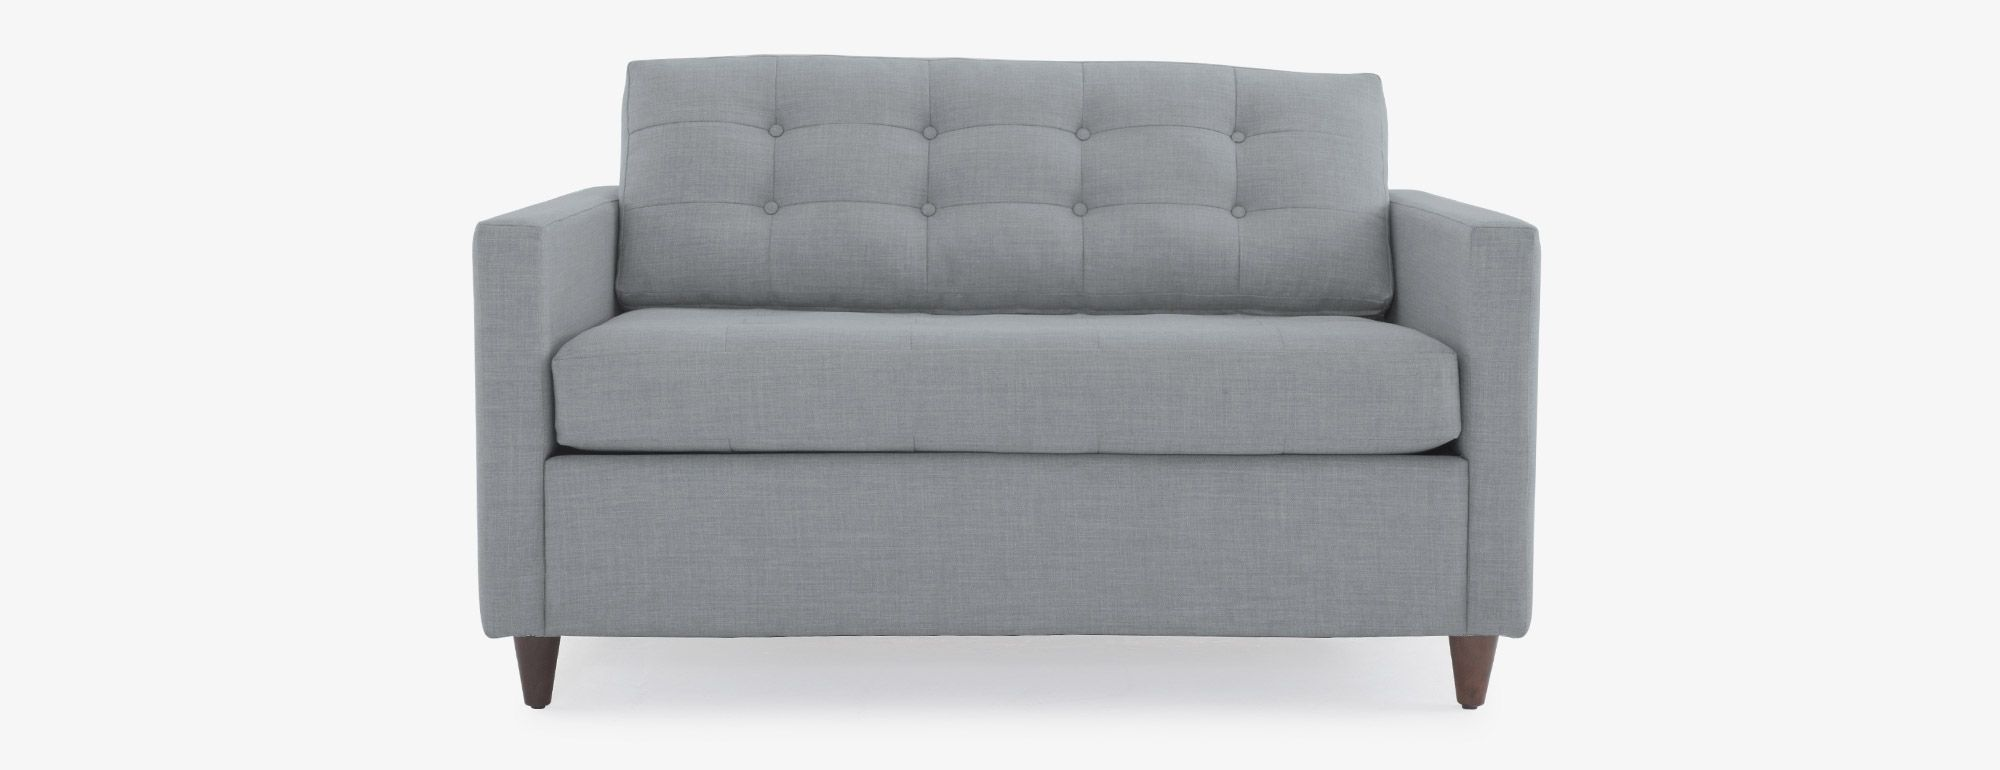 Eliot Twin Sleeper   Seating   Sofa furniture, Sleeper chair ...